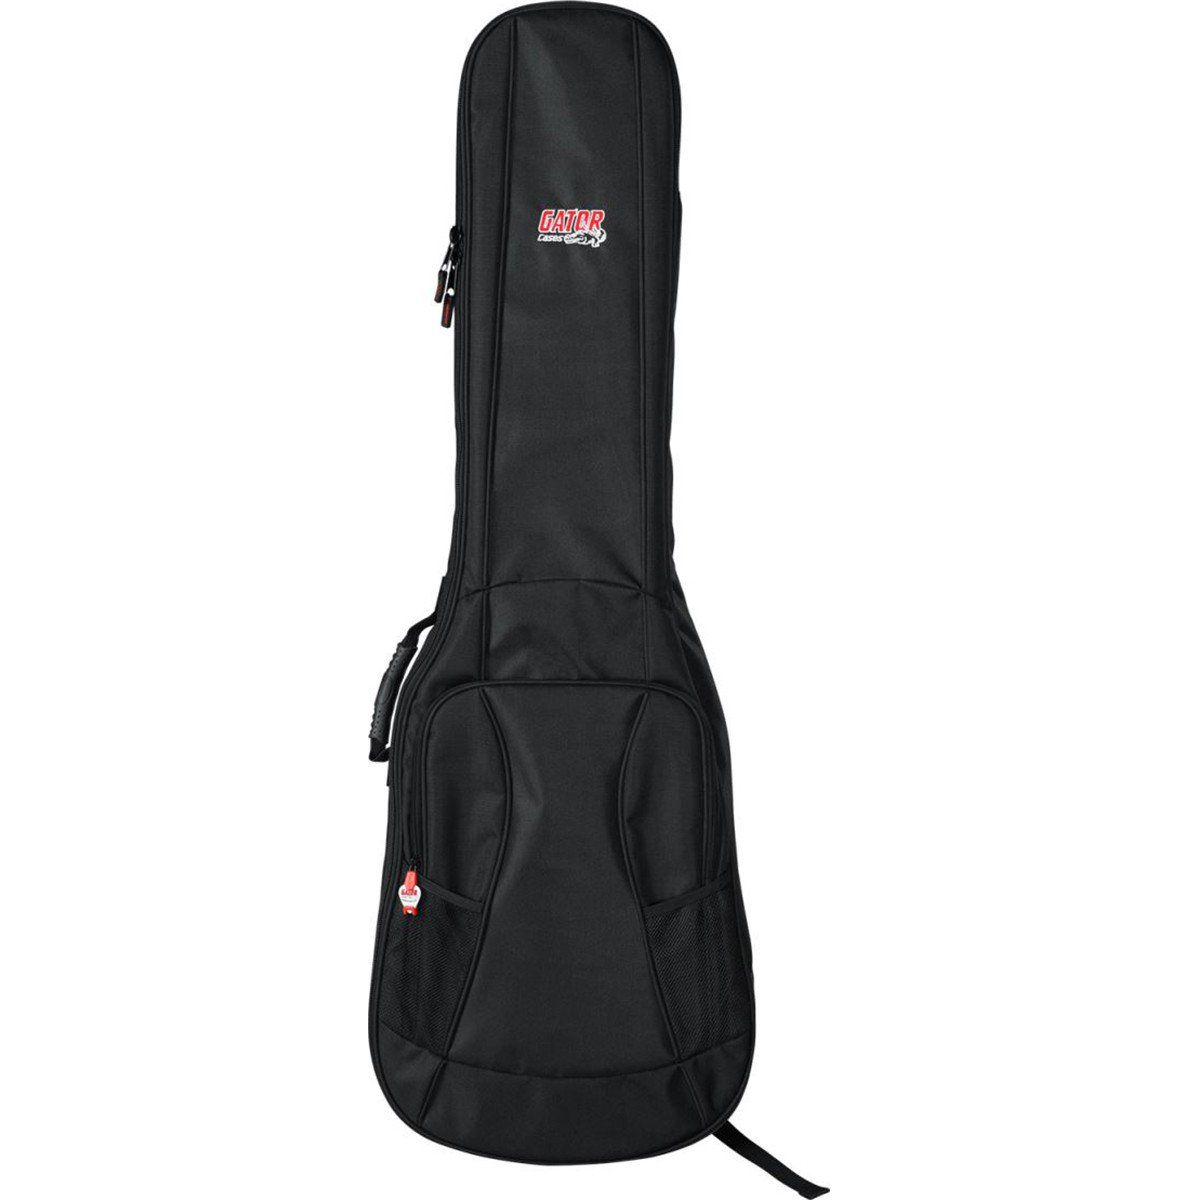 Gator GB-4G-Bass Bag Gator GB 4G Bass para Contrabaixo